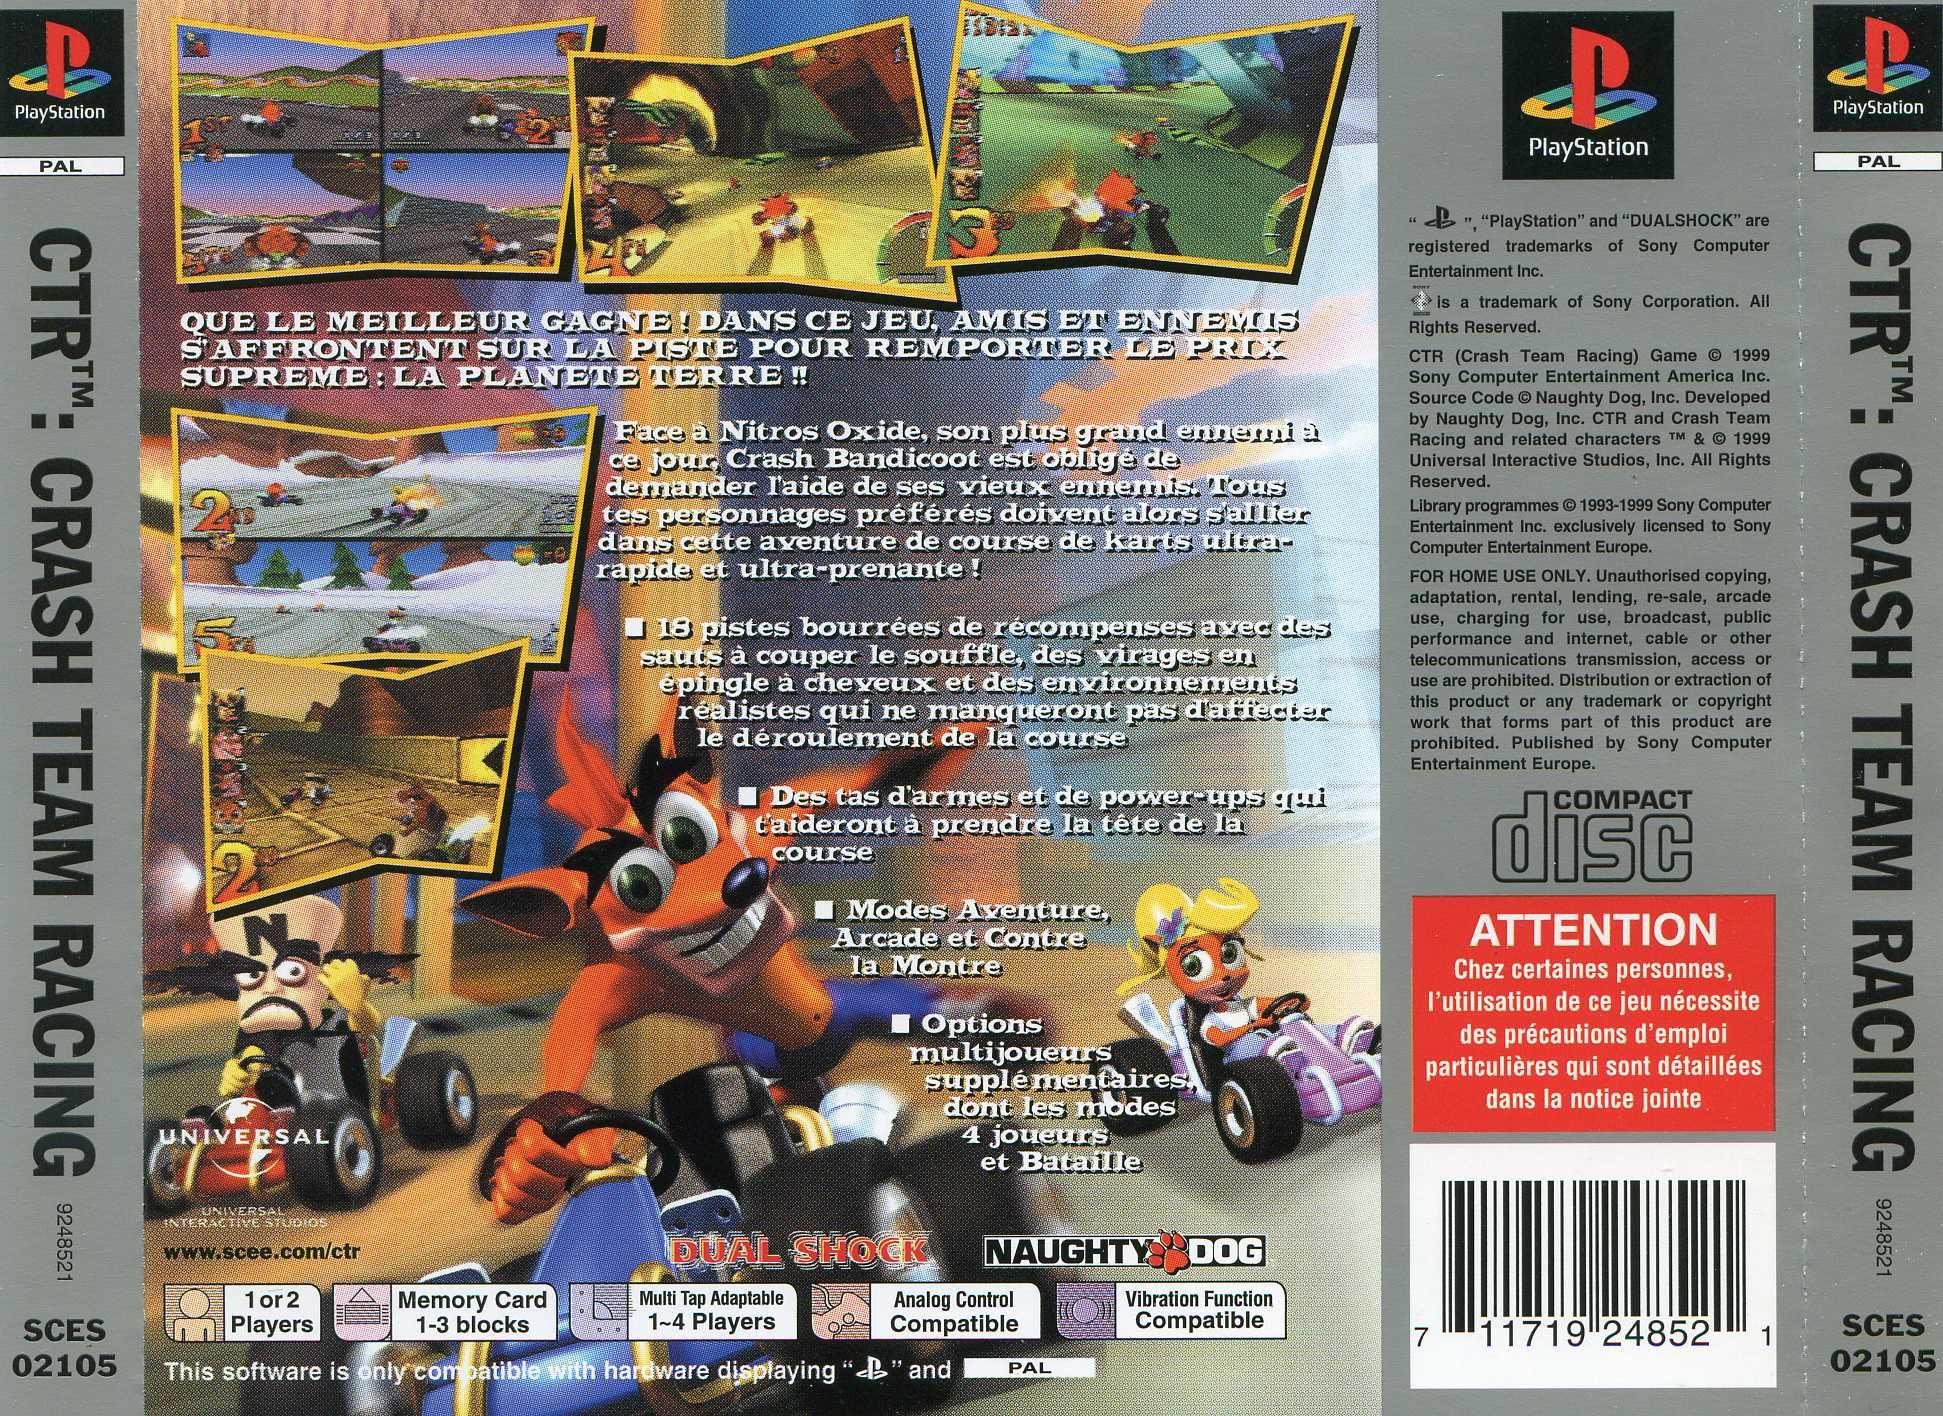 Crash Team Racing Psx Front Cover - Imagez co